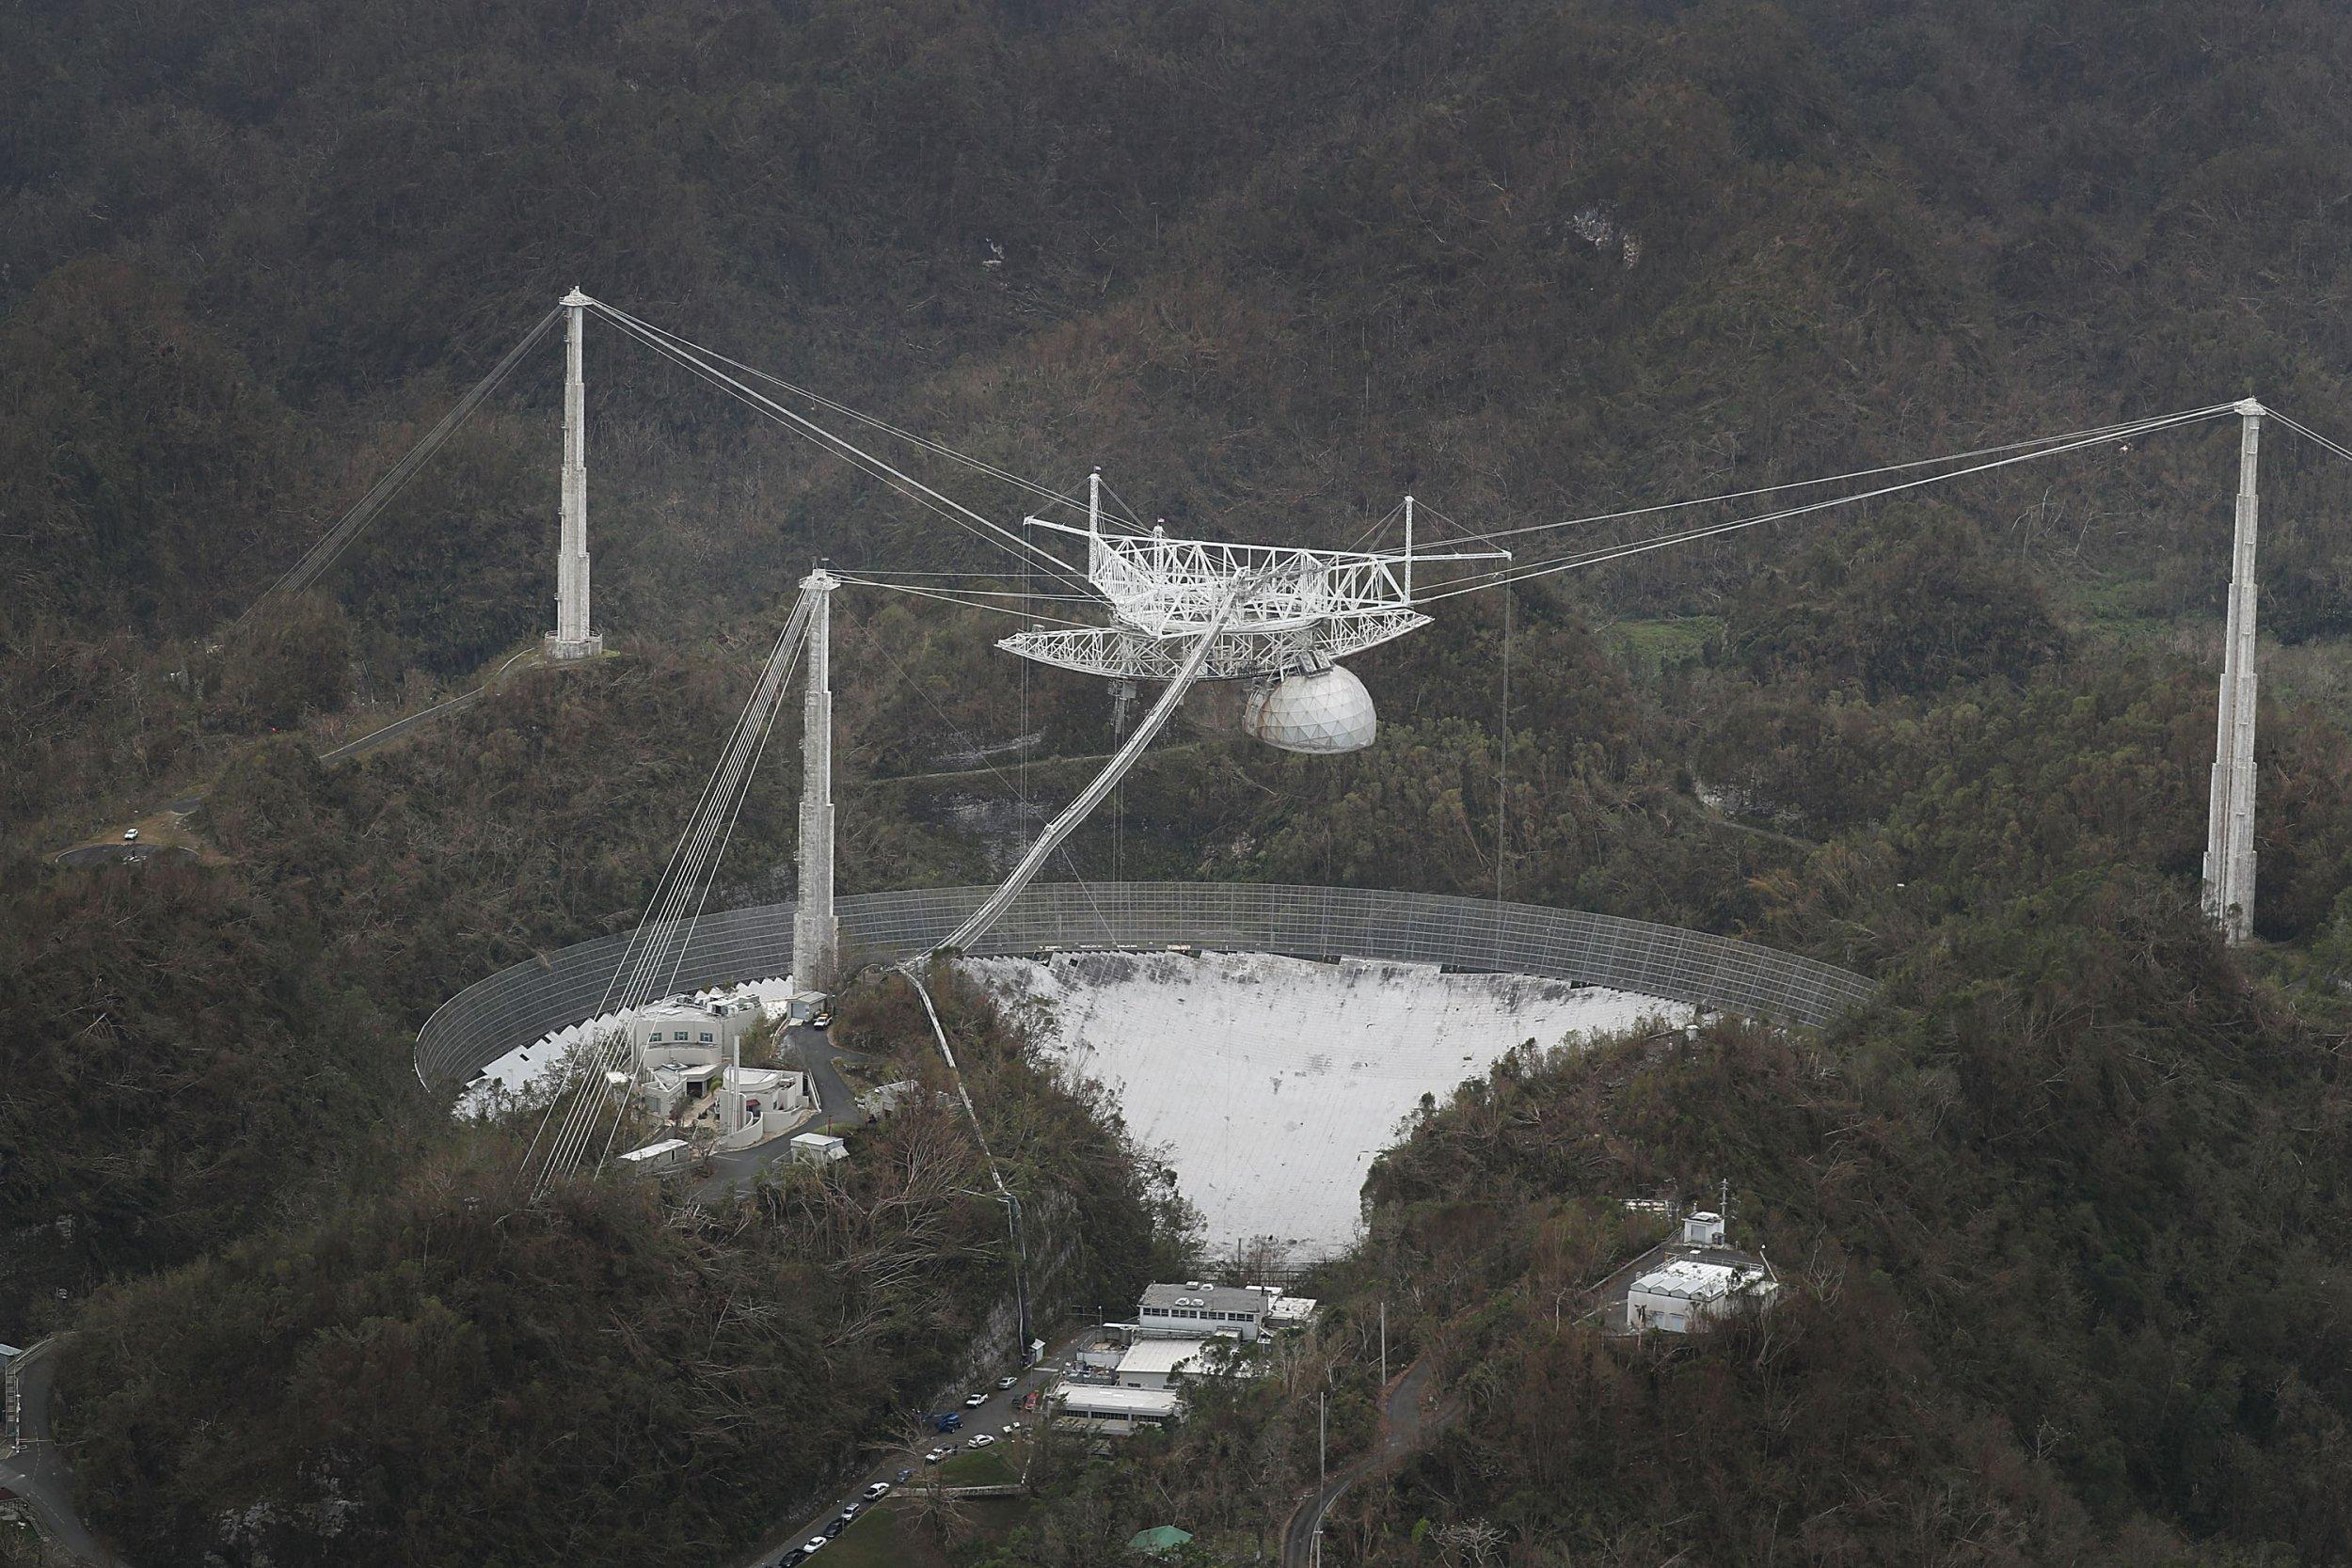 12_24_Arecibo Observatory